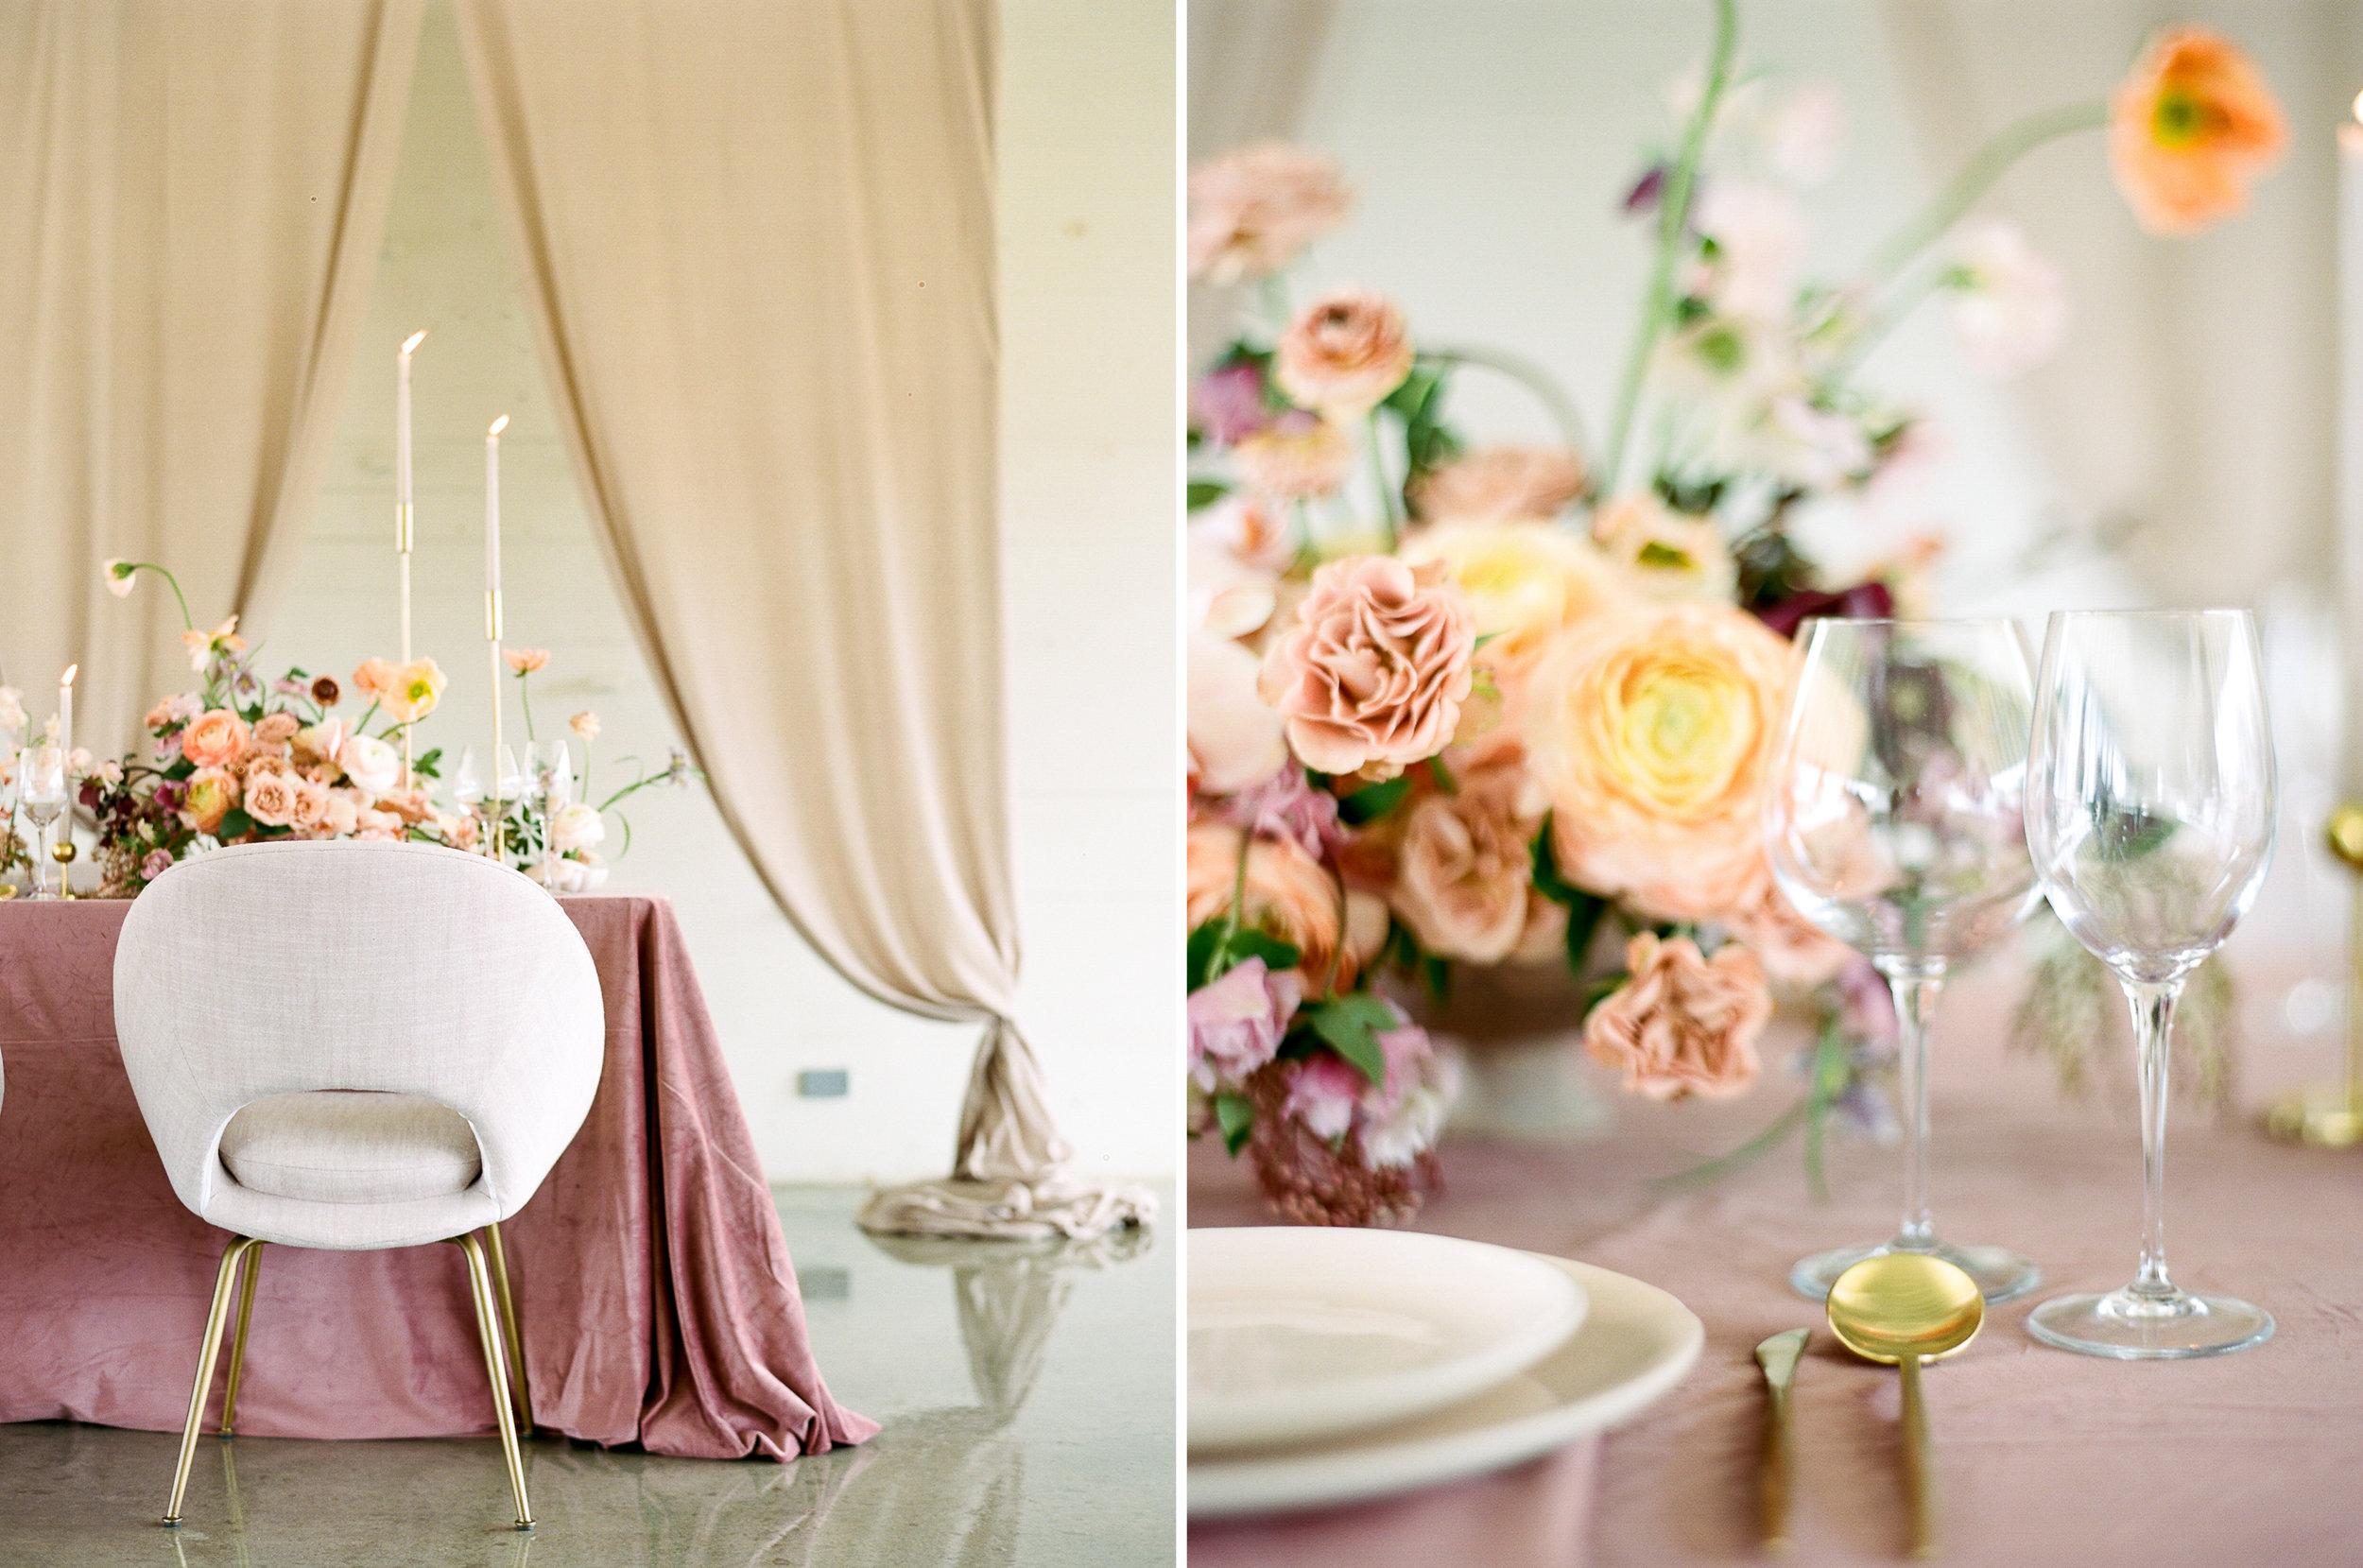 Austin-Wedding-Photography-Prospect-House-Fine-Art-Film-Destination-Dana-Josh-Fernandez-Photography-Dallas-Houston-Luxury-Best-Top-111.jpg